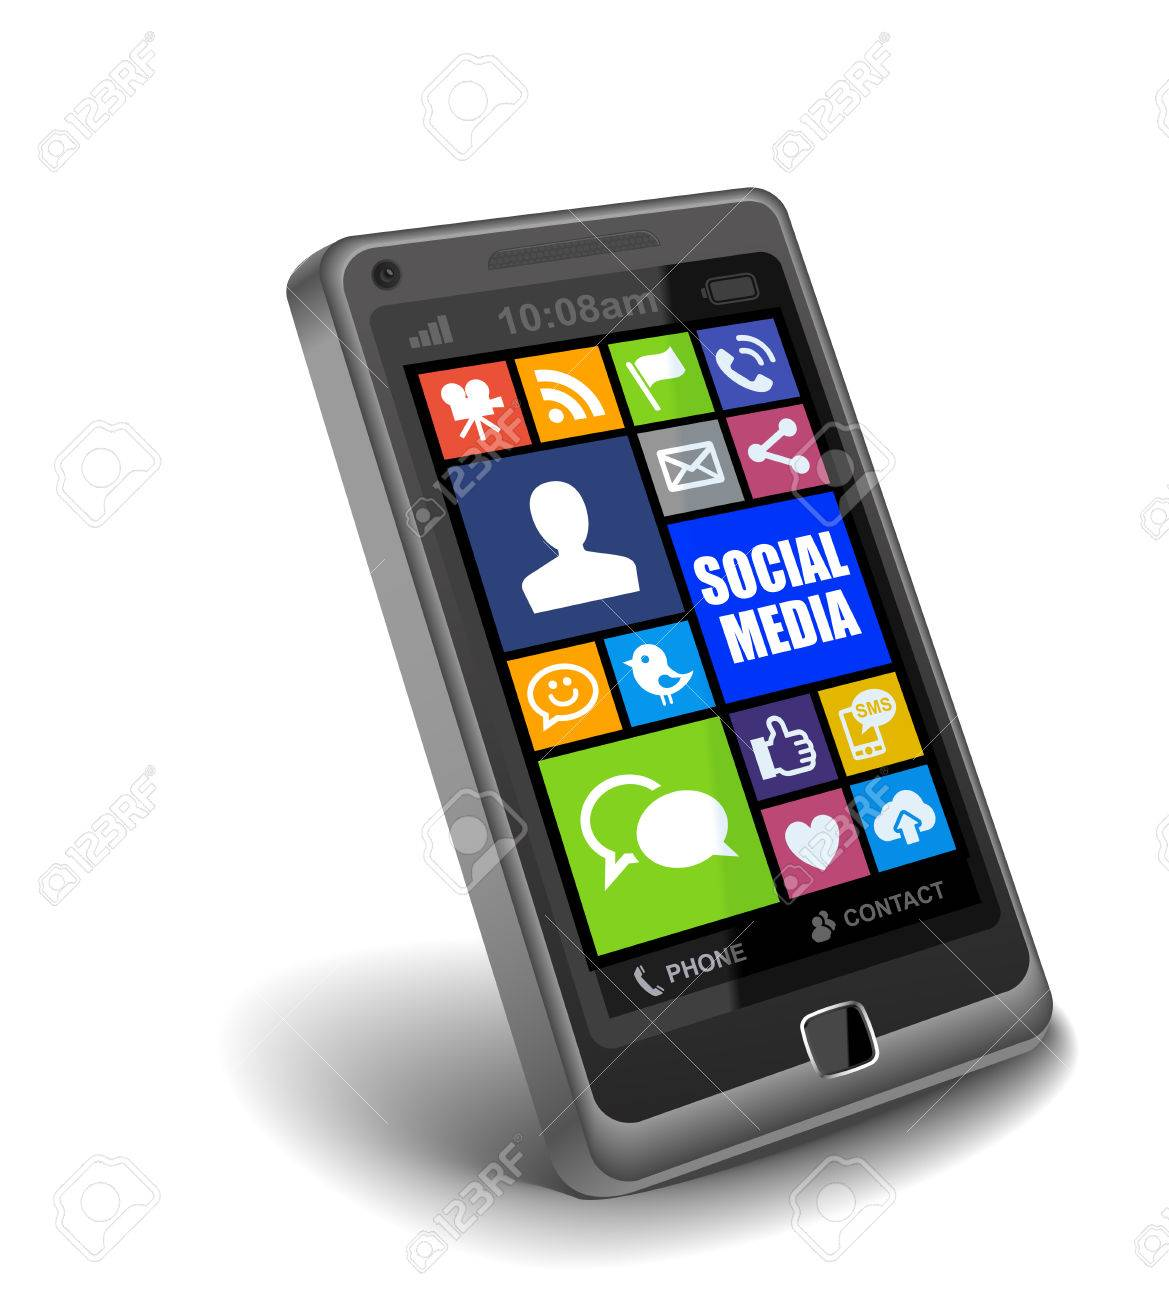 Social Media Apps on Smartphone Stock Photo - 26062774